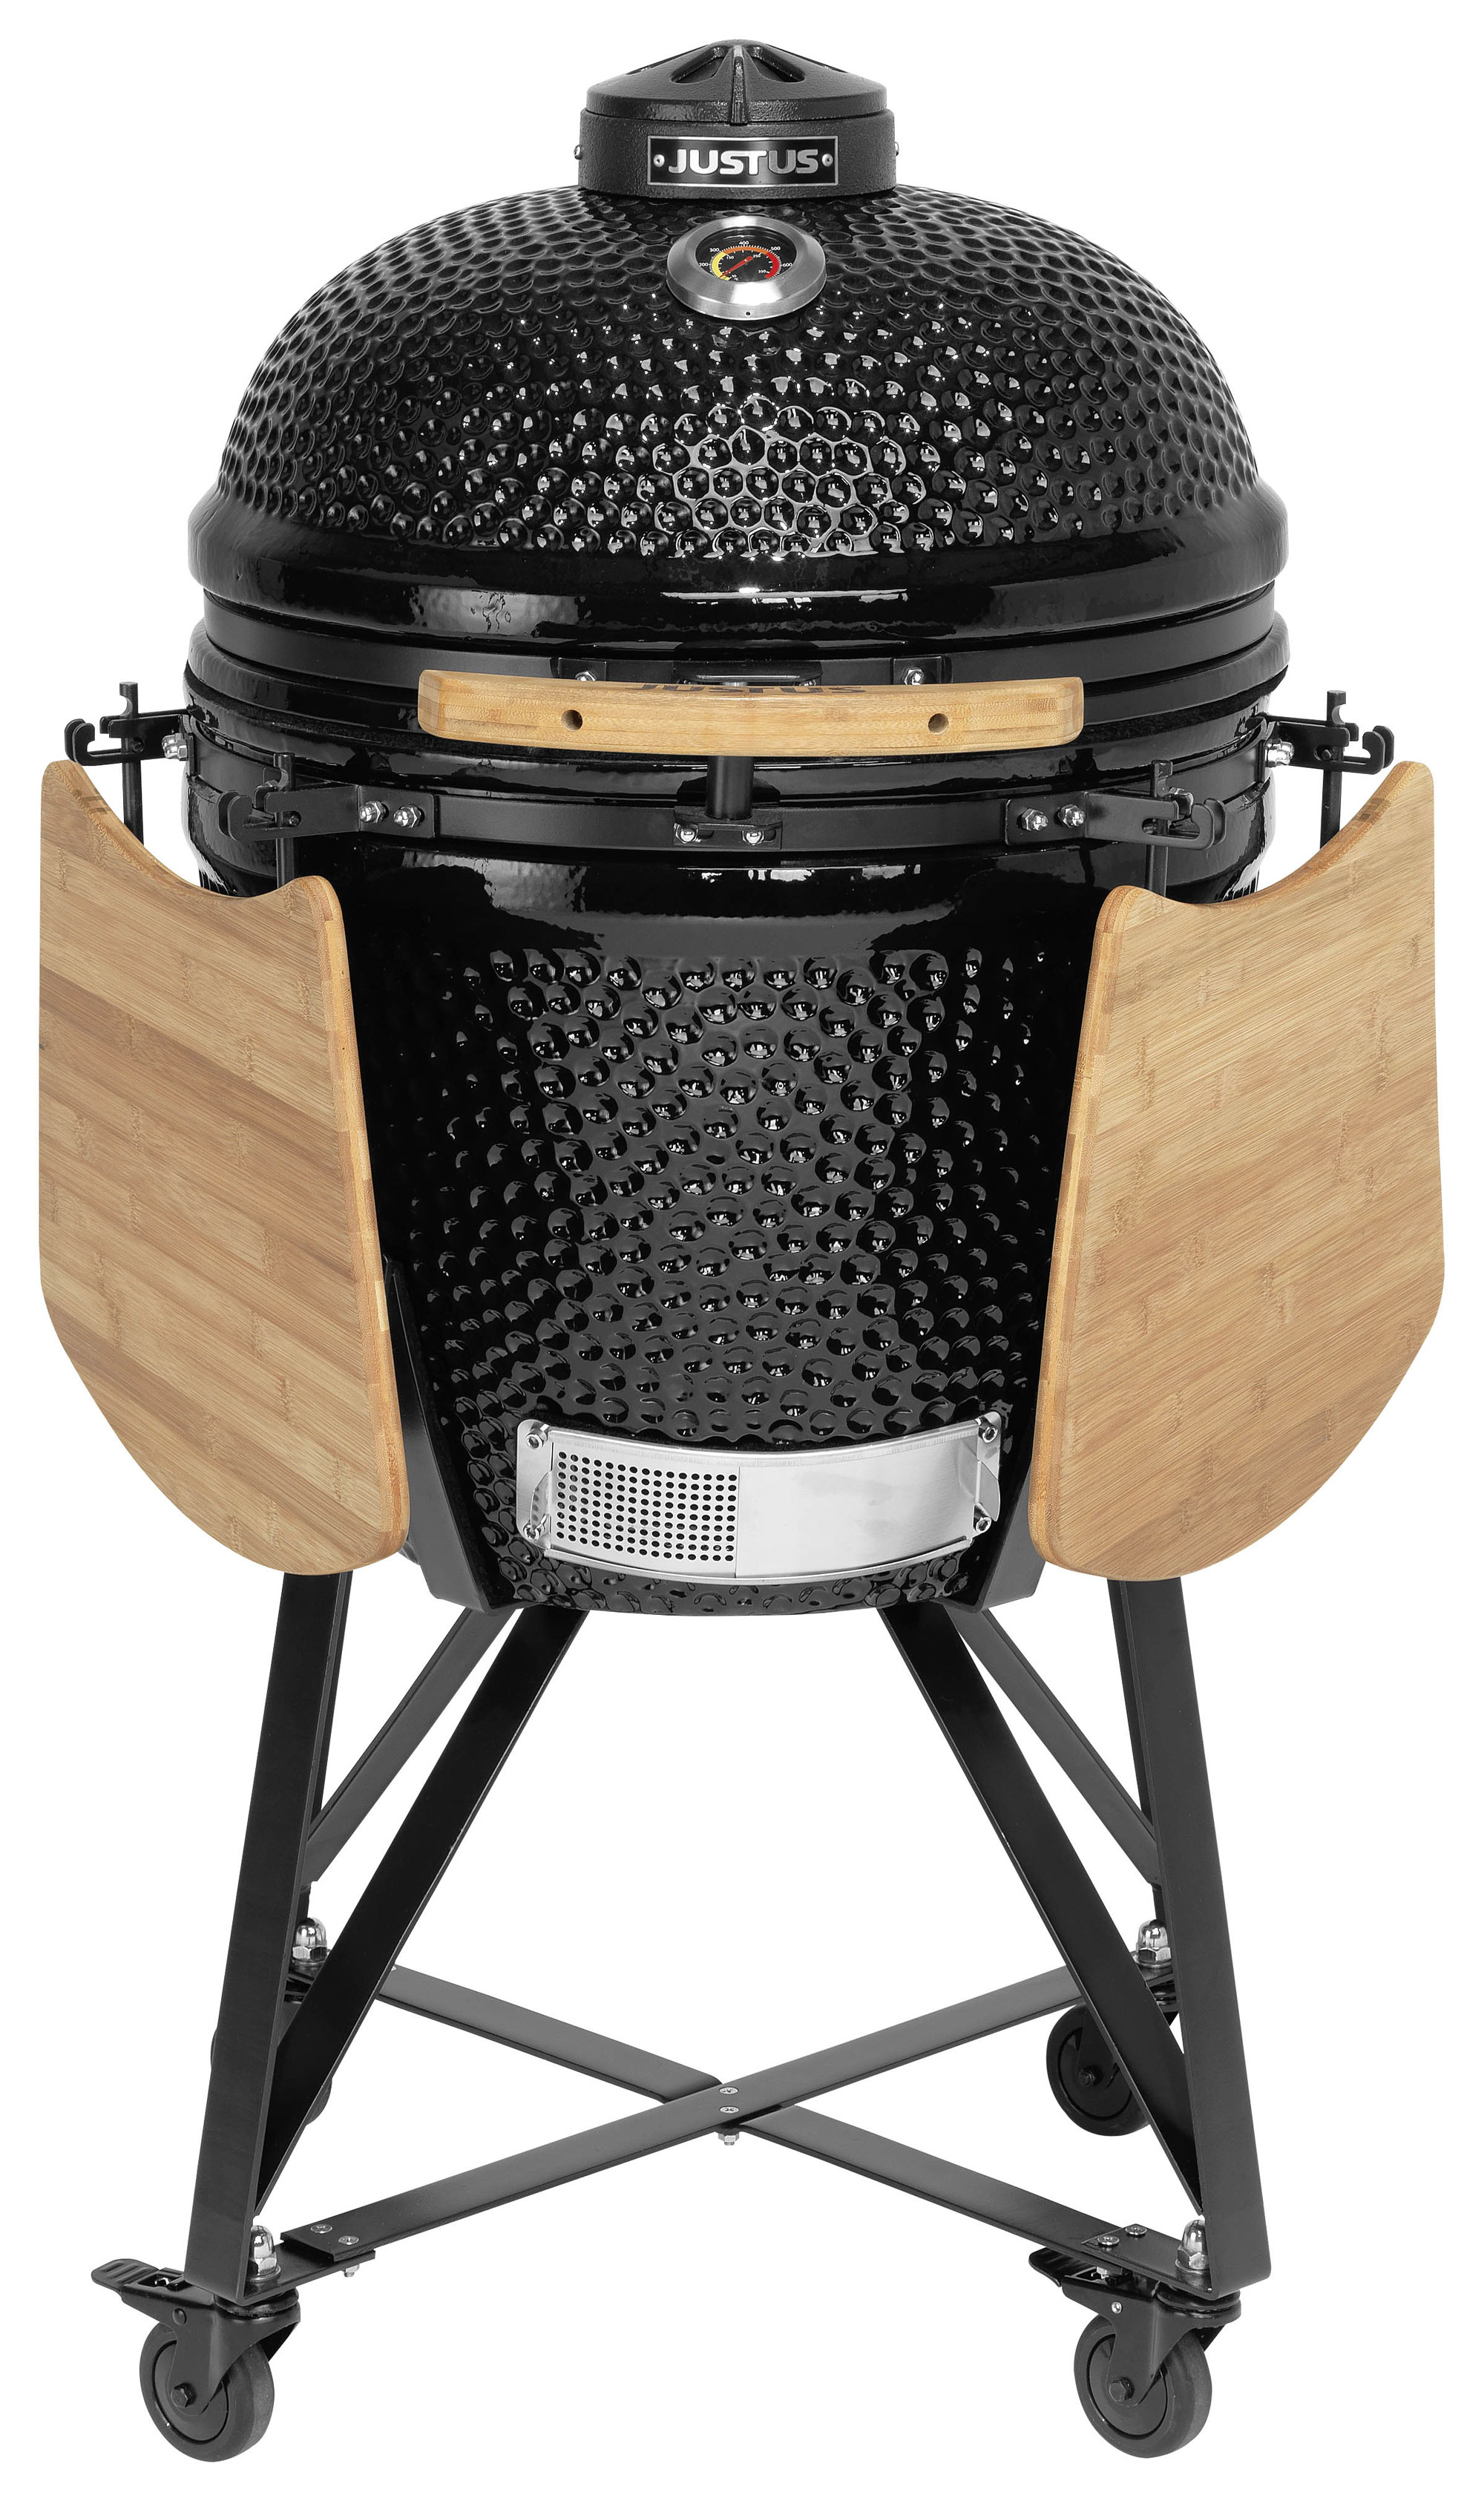 Holzkohlegrill / Keramikgrill Justus Black J'Egg XL Grillfläche Ø47cm Bild 1